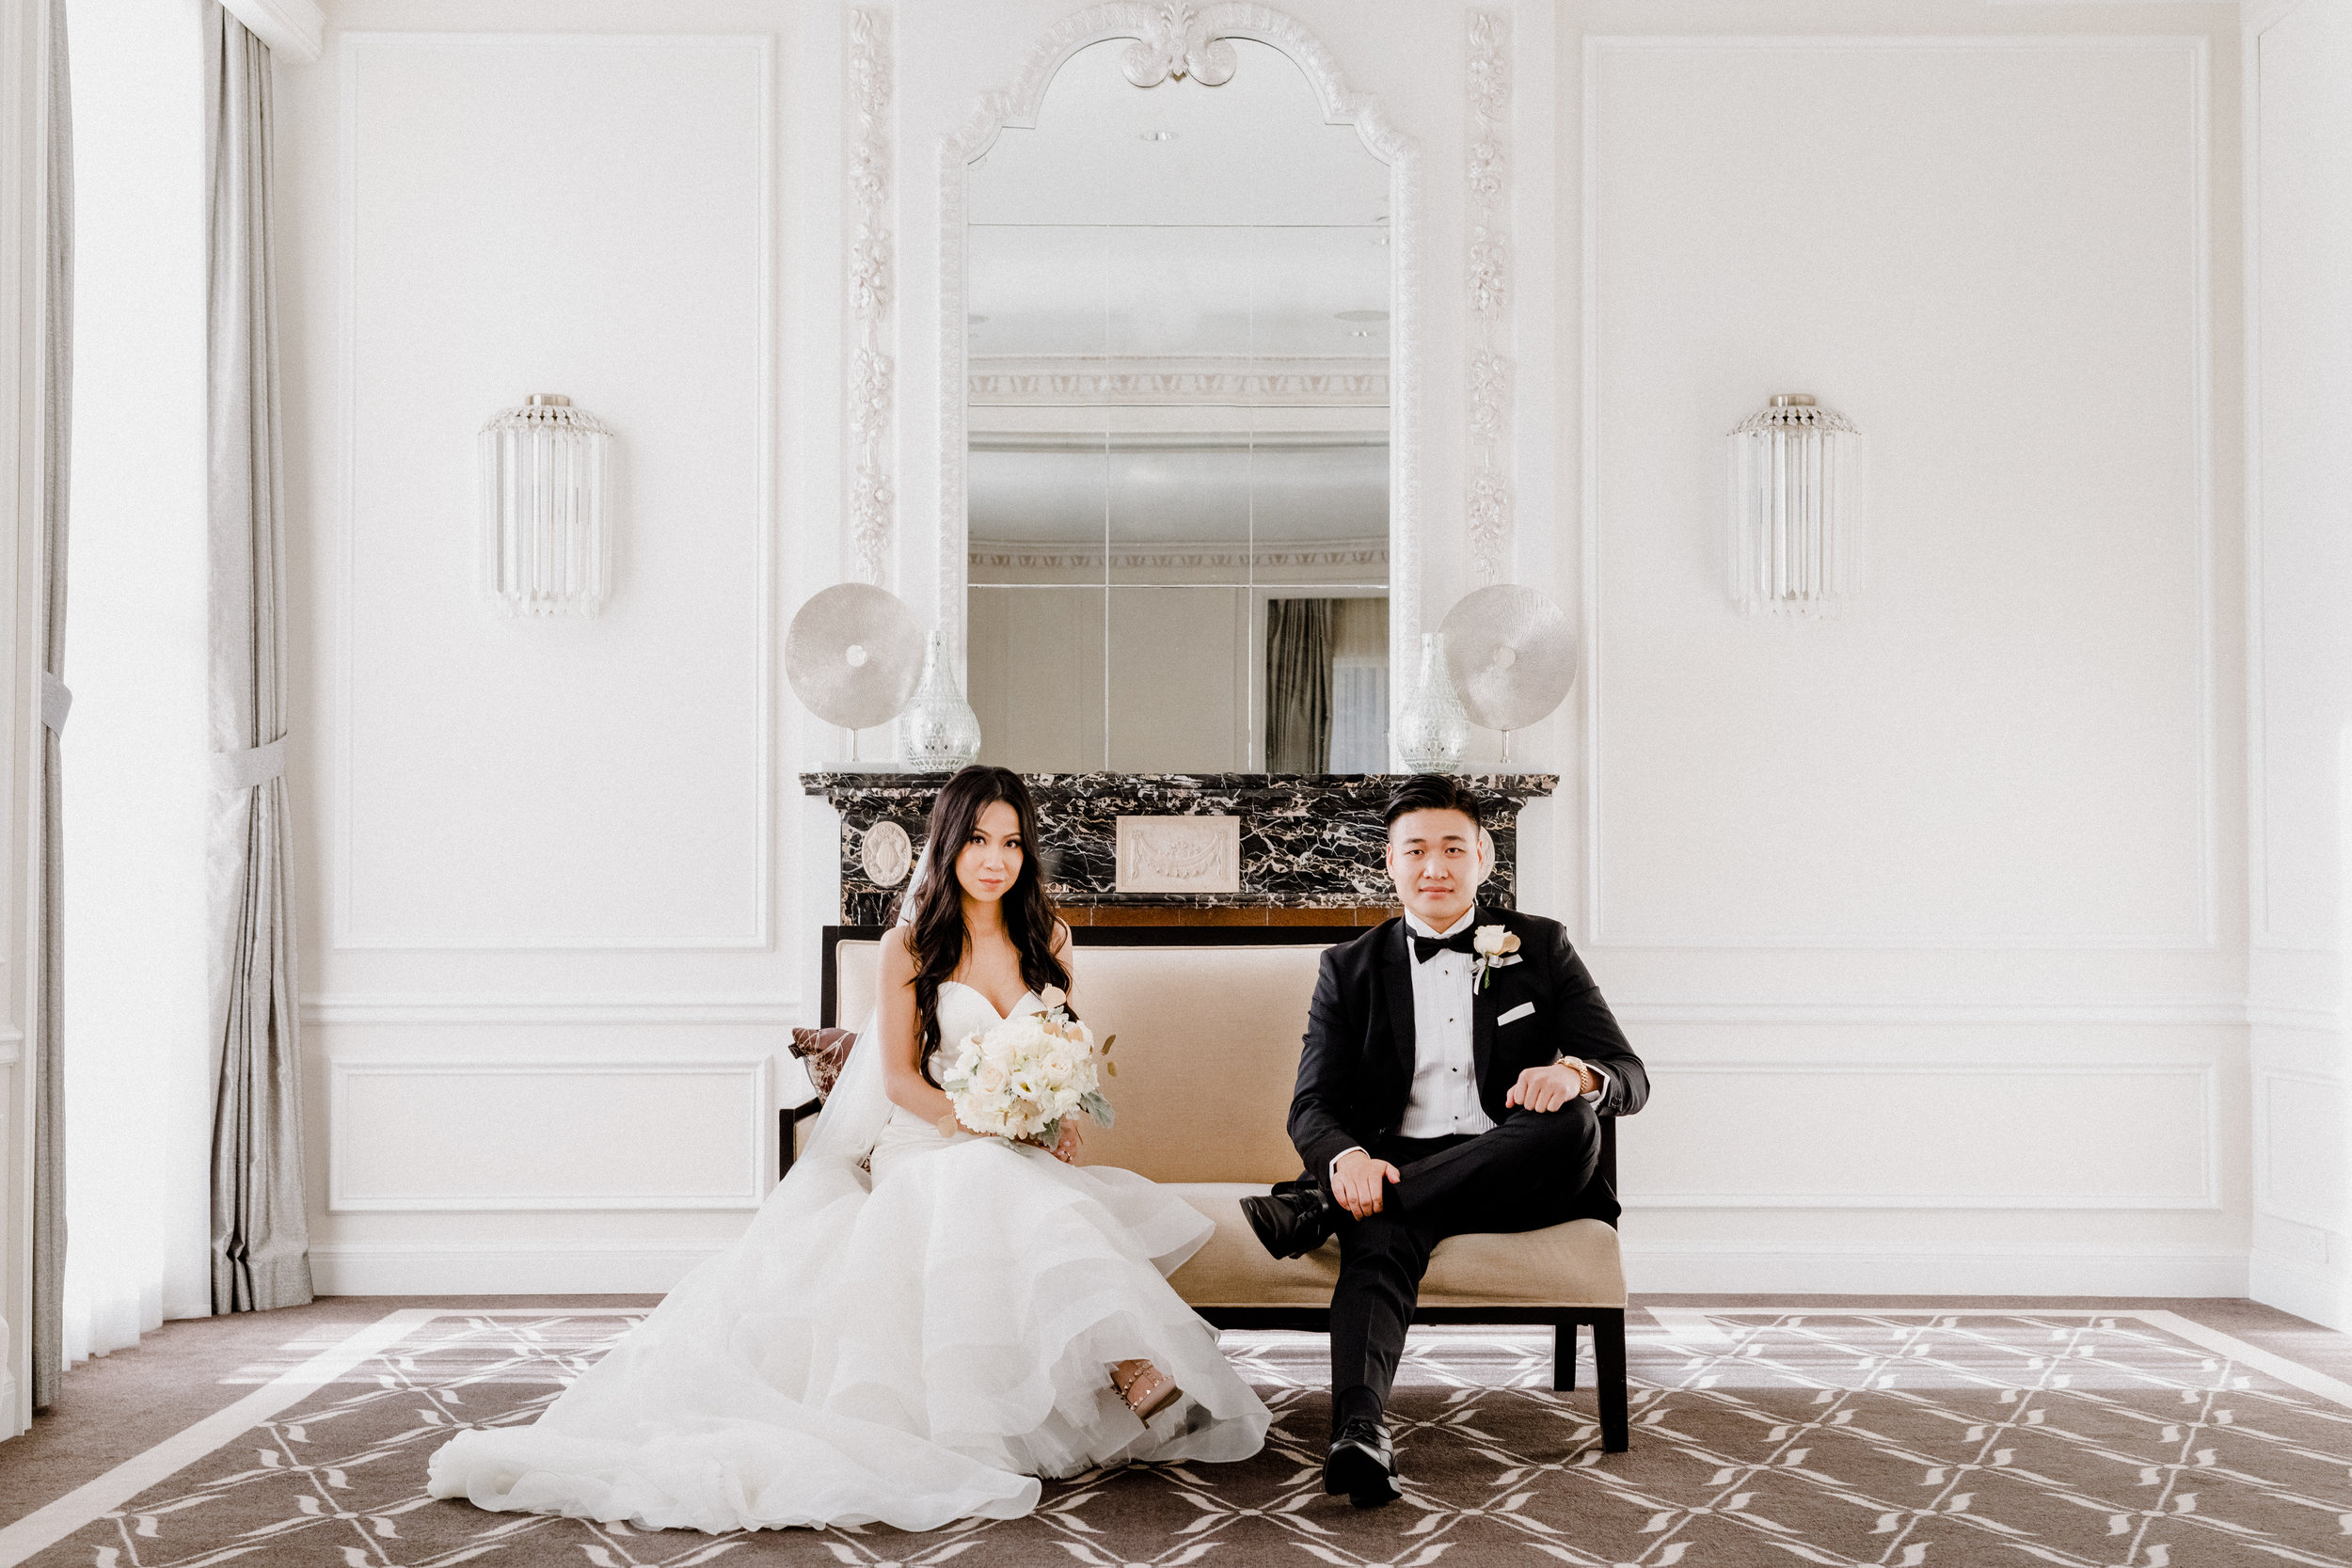 HeraStudios_Selects_Full_KatrinaAndrew_Wedding_Version2-320.jpg